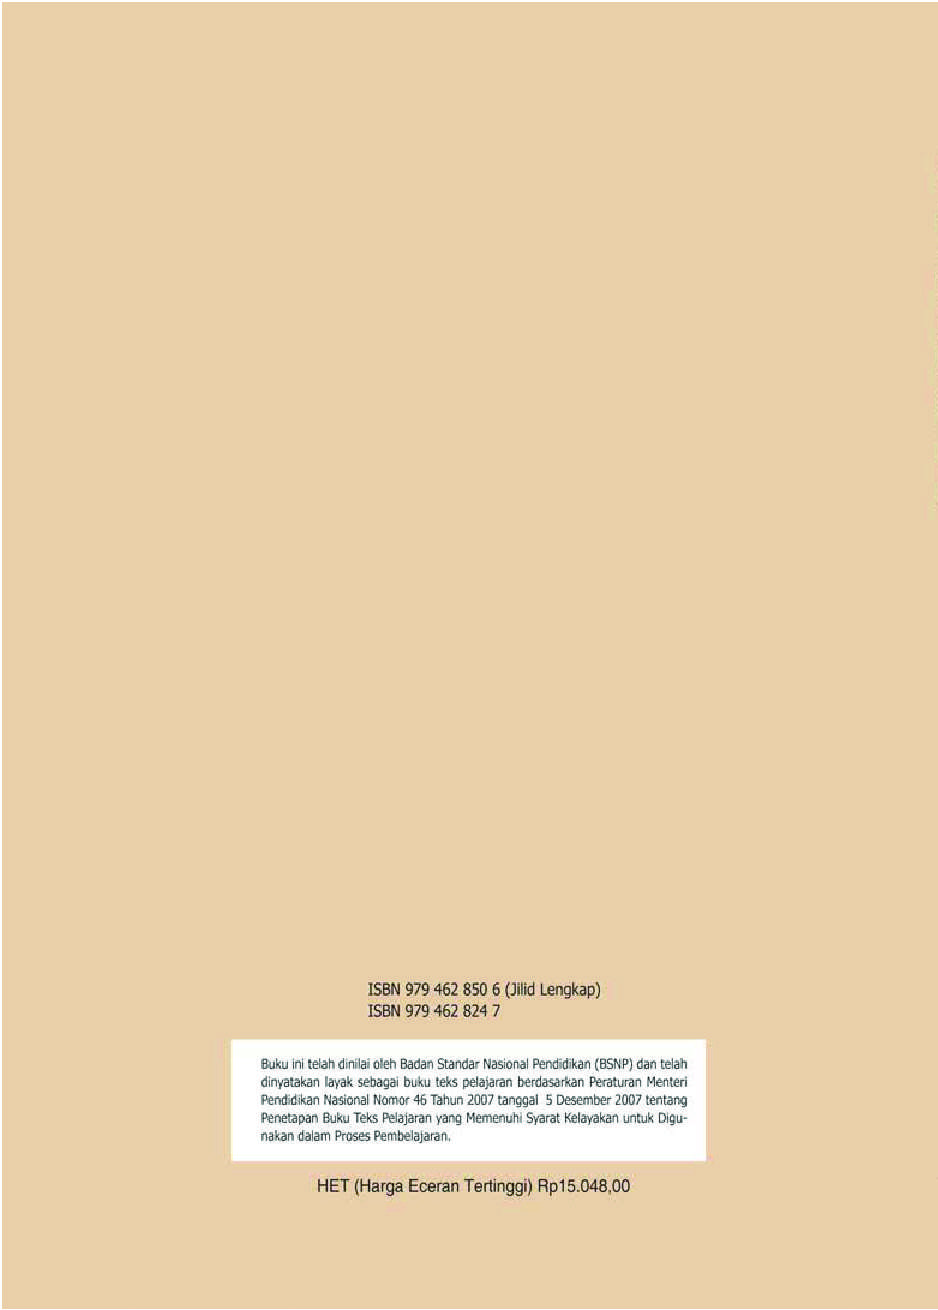 Jual Buku Sma Kelas 10 Bahasa Indonesia Aktif Dan Kreatif Berbahasa Indonesia Oleh Adi Abdul